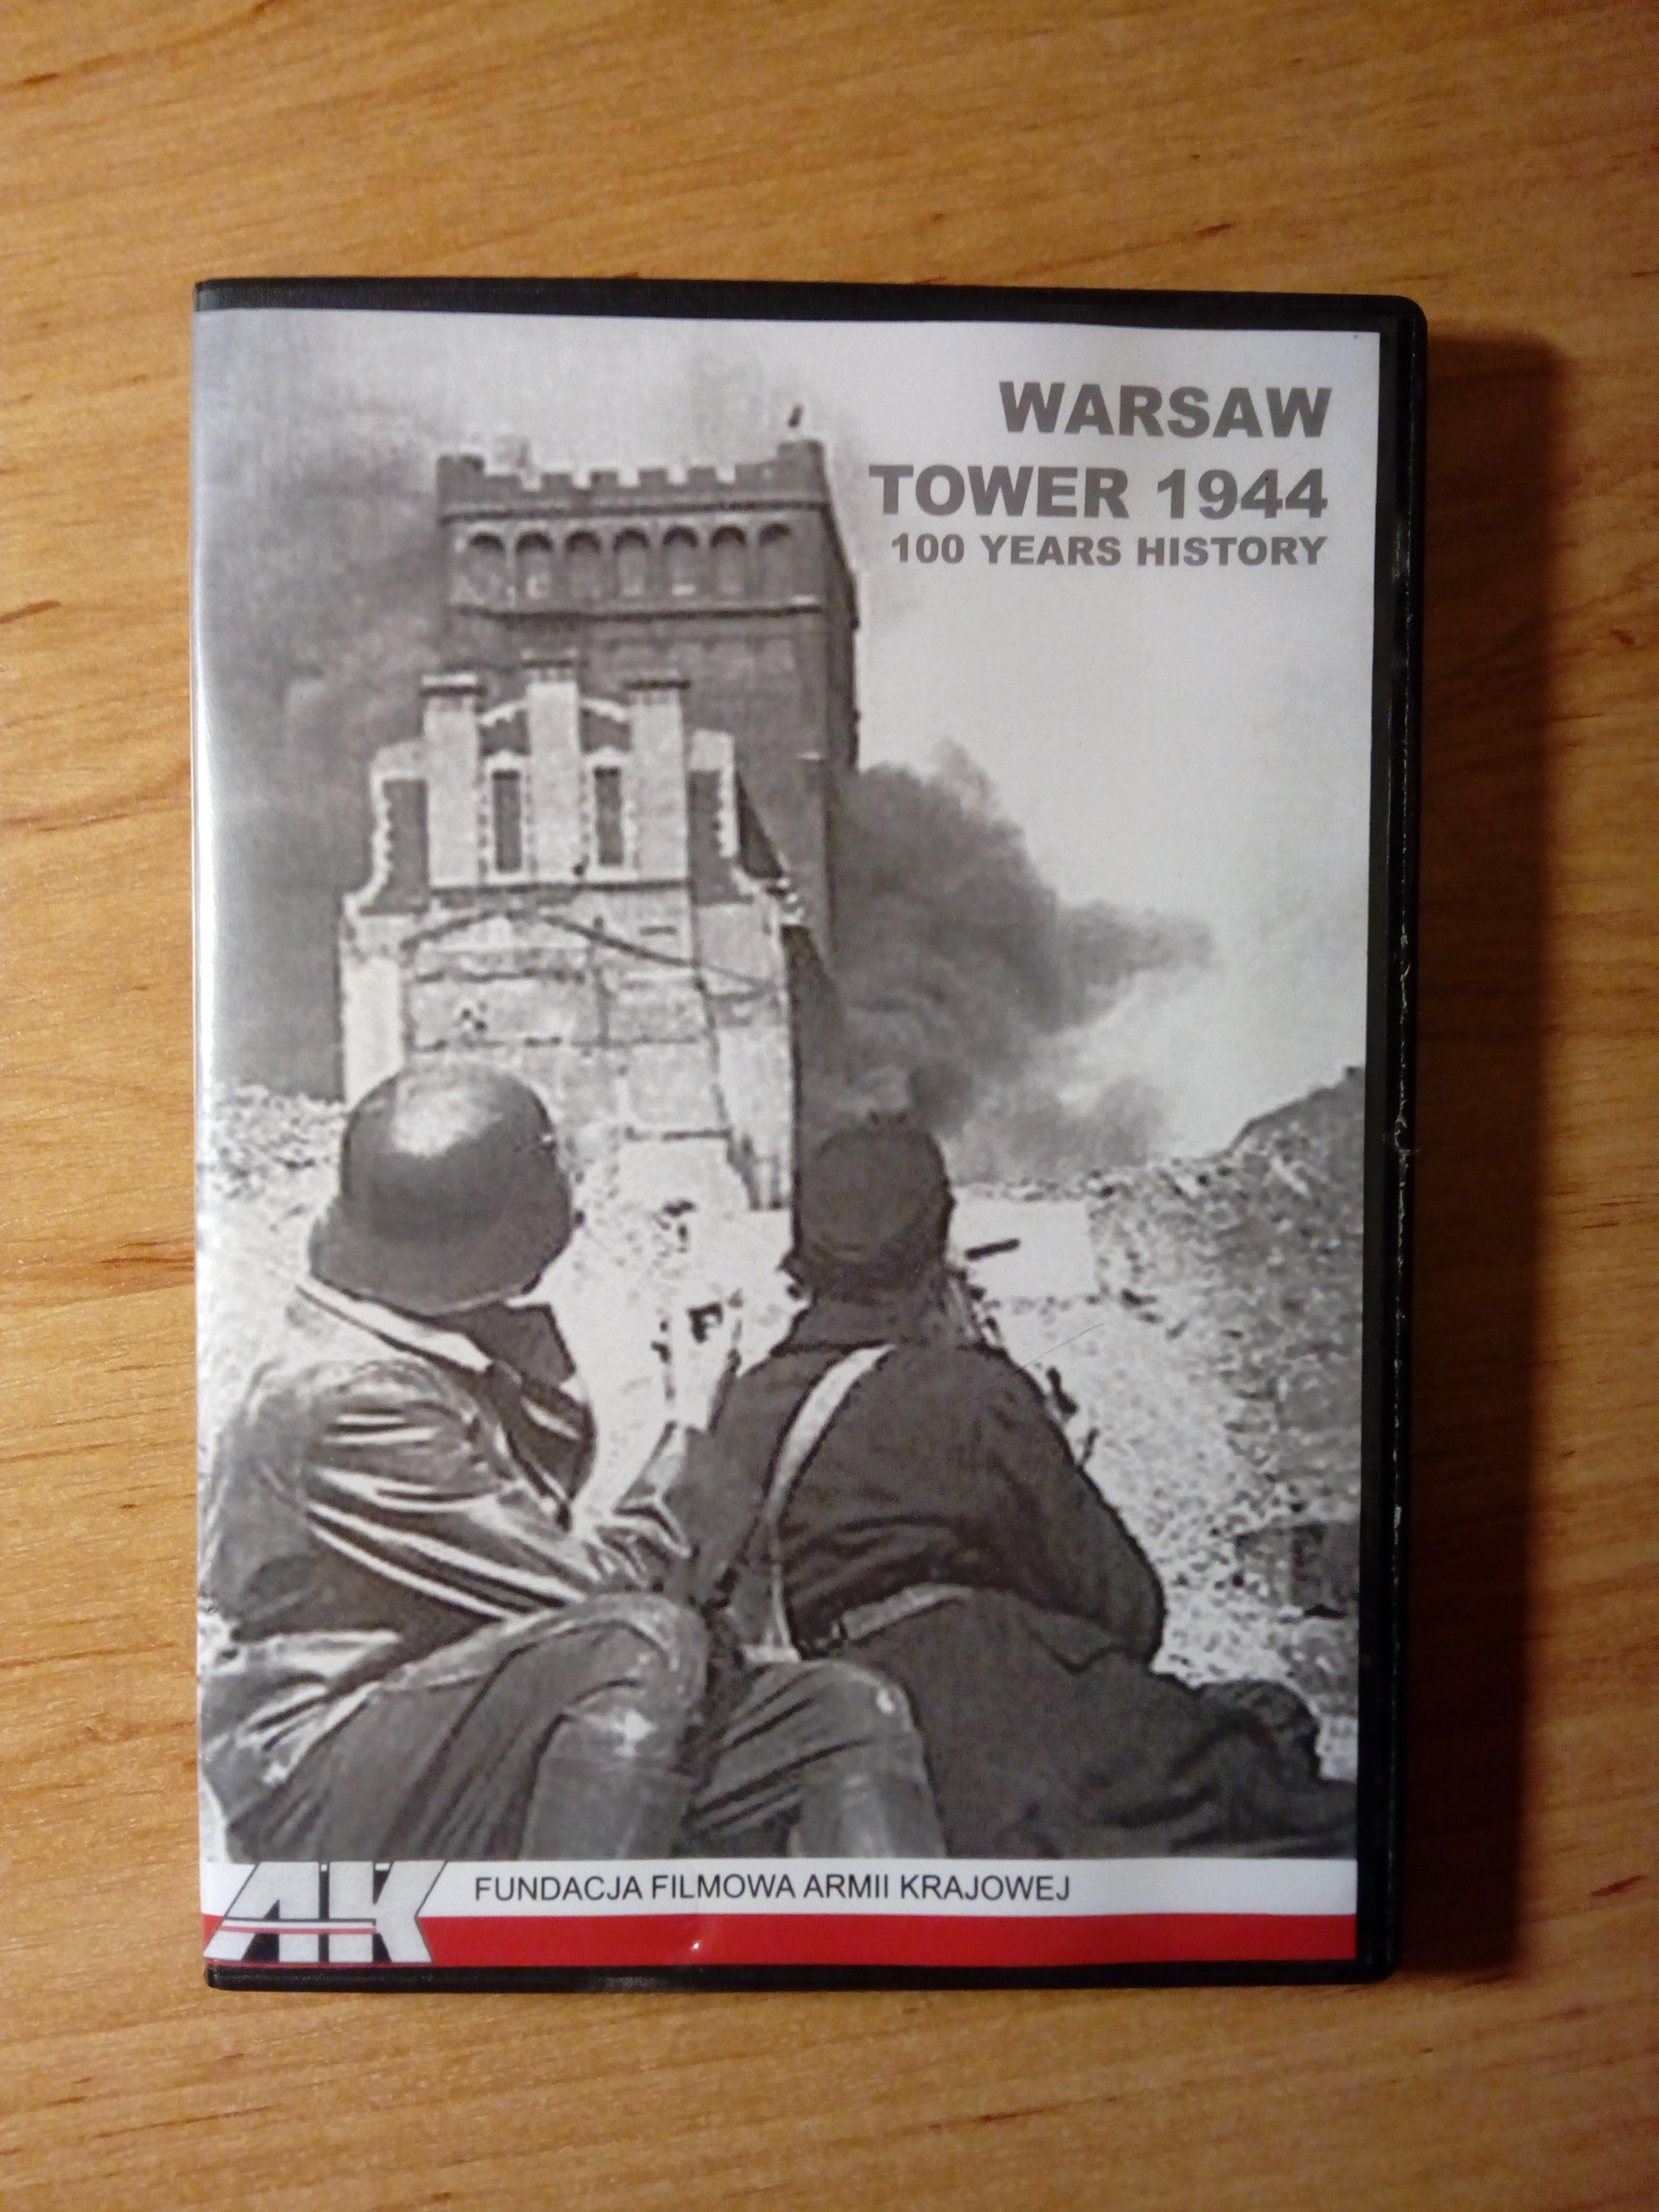 Warsaw Tower 1944 DVD 100 Years History (M.Widarski)